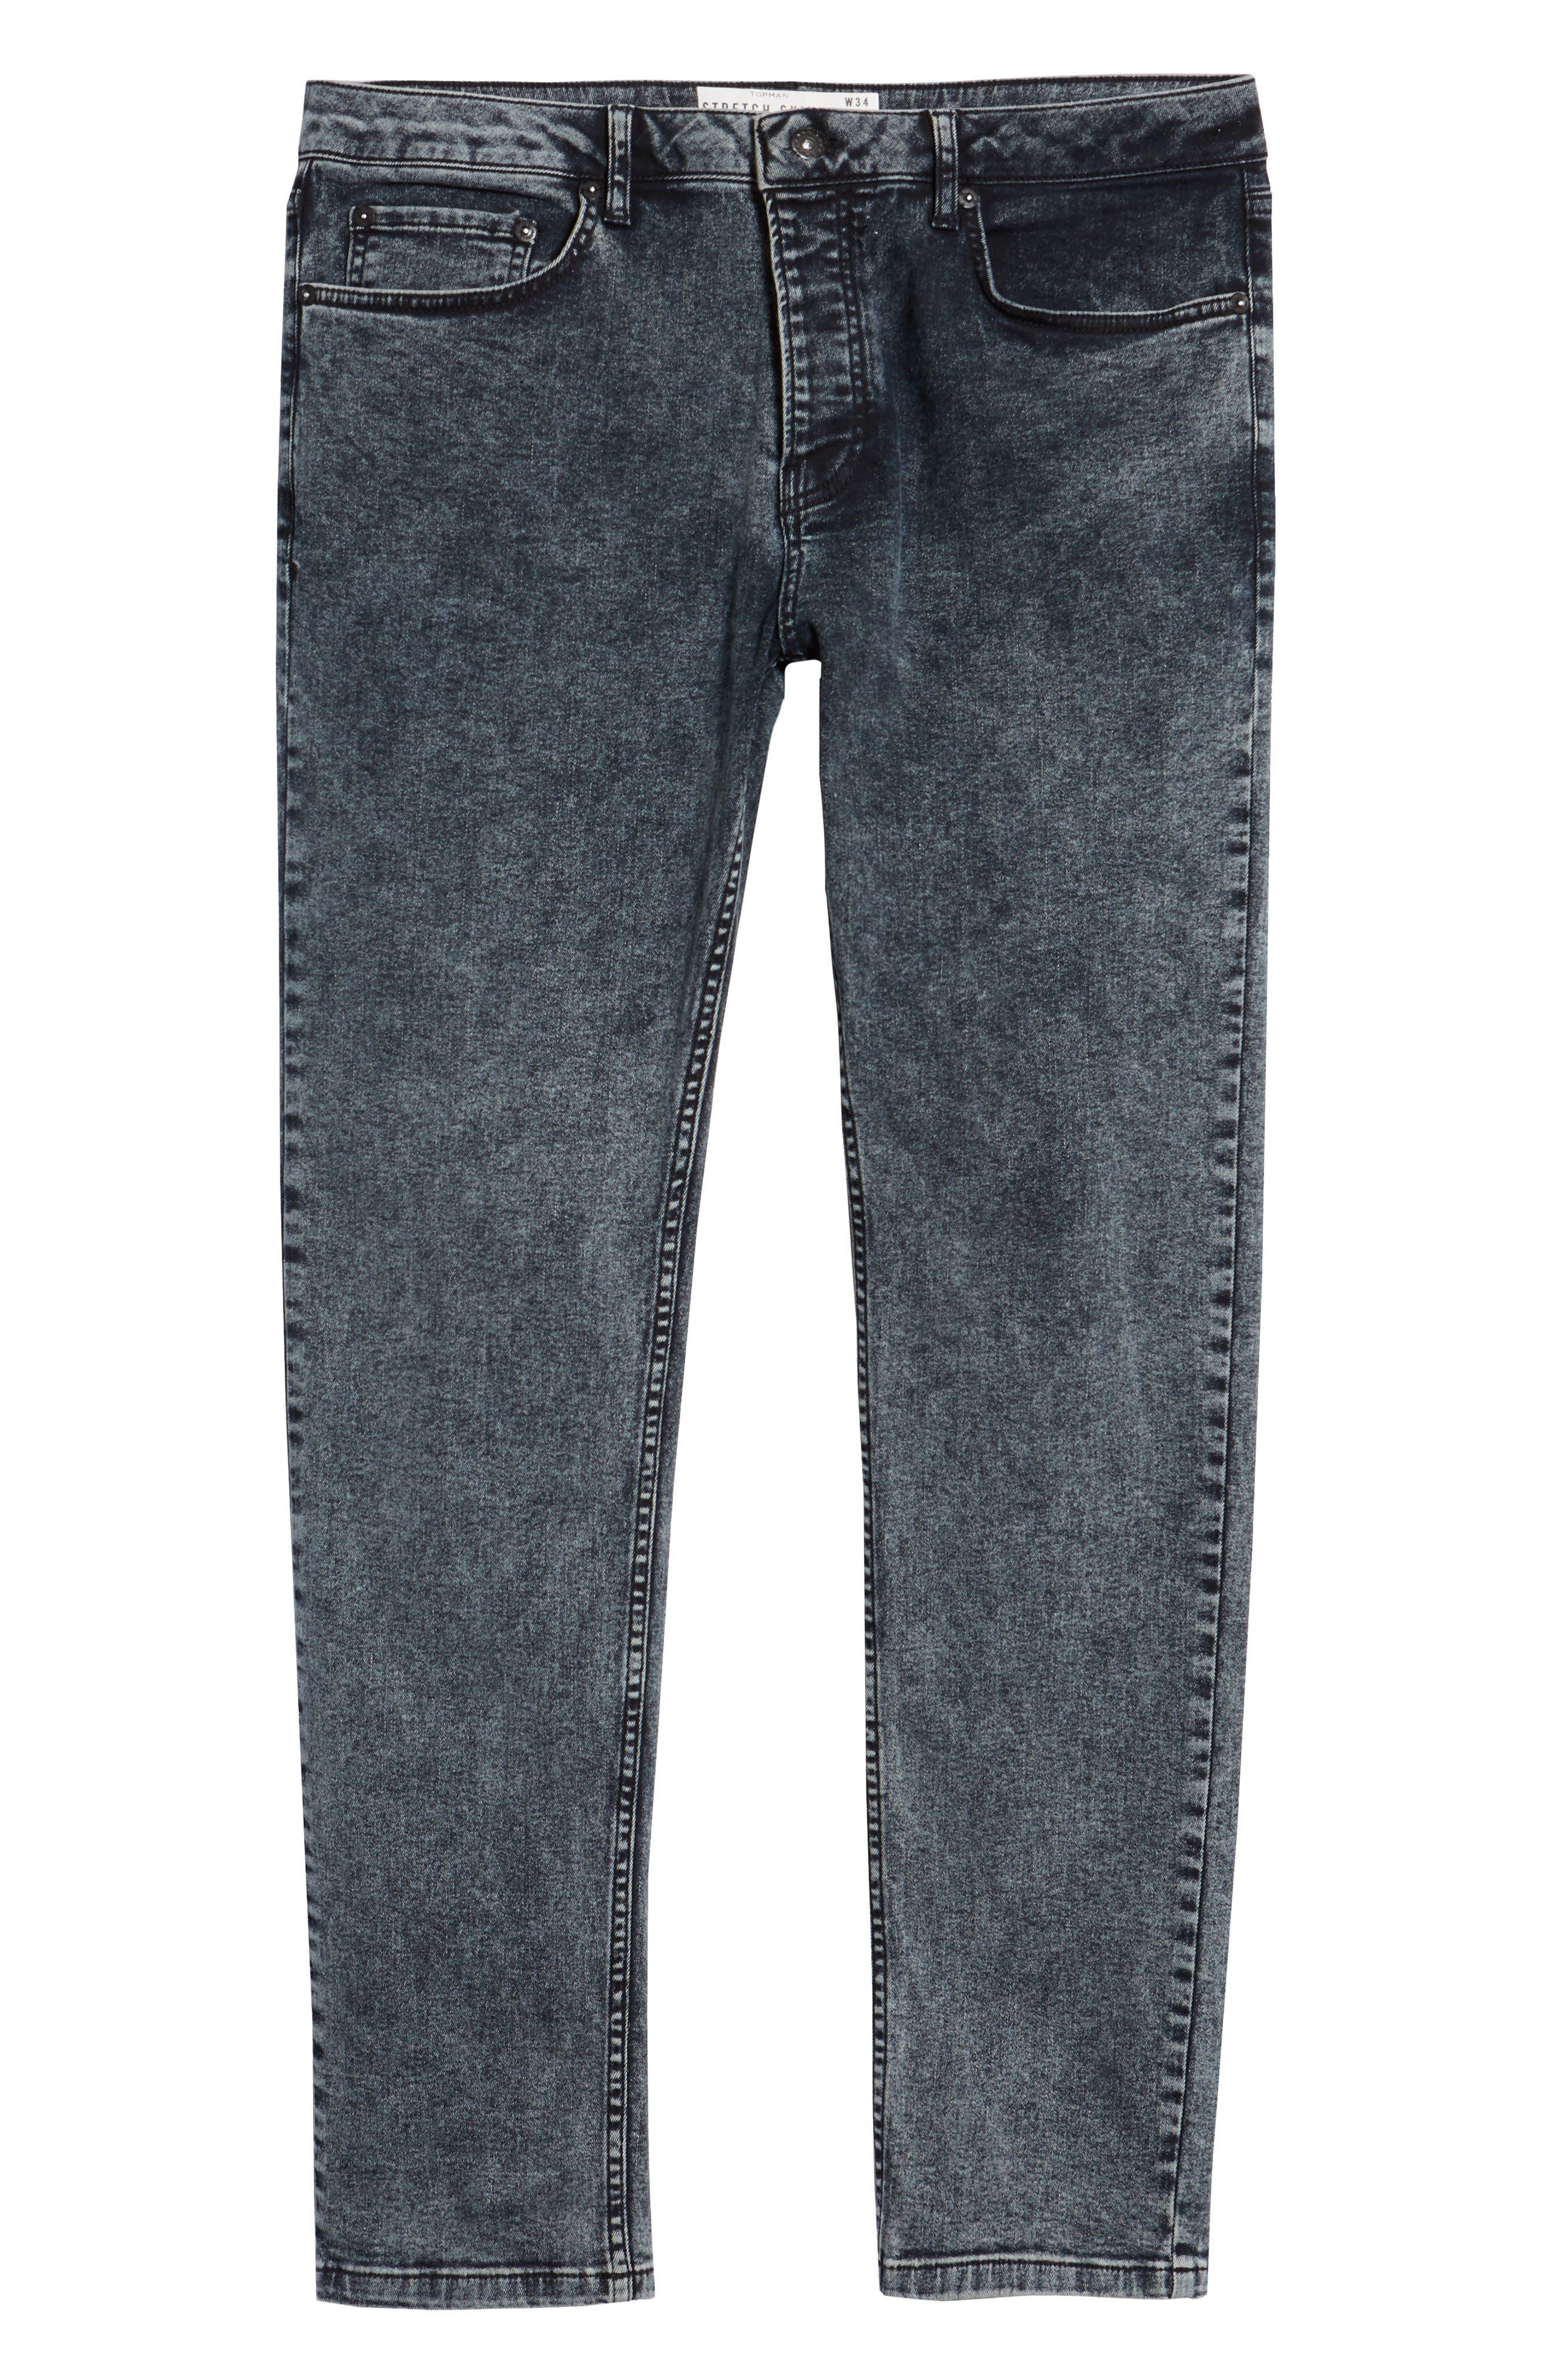 Acid Wash Stretch Skinny Jeans,                             Alternate thumbnail 6, color,                             GREY